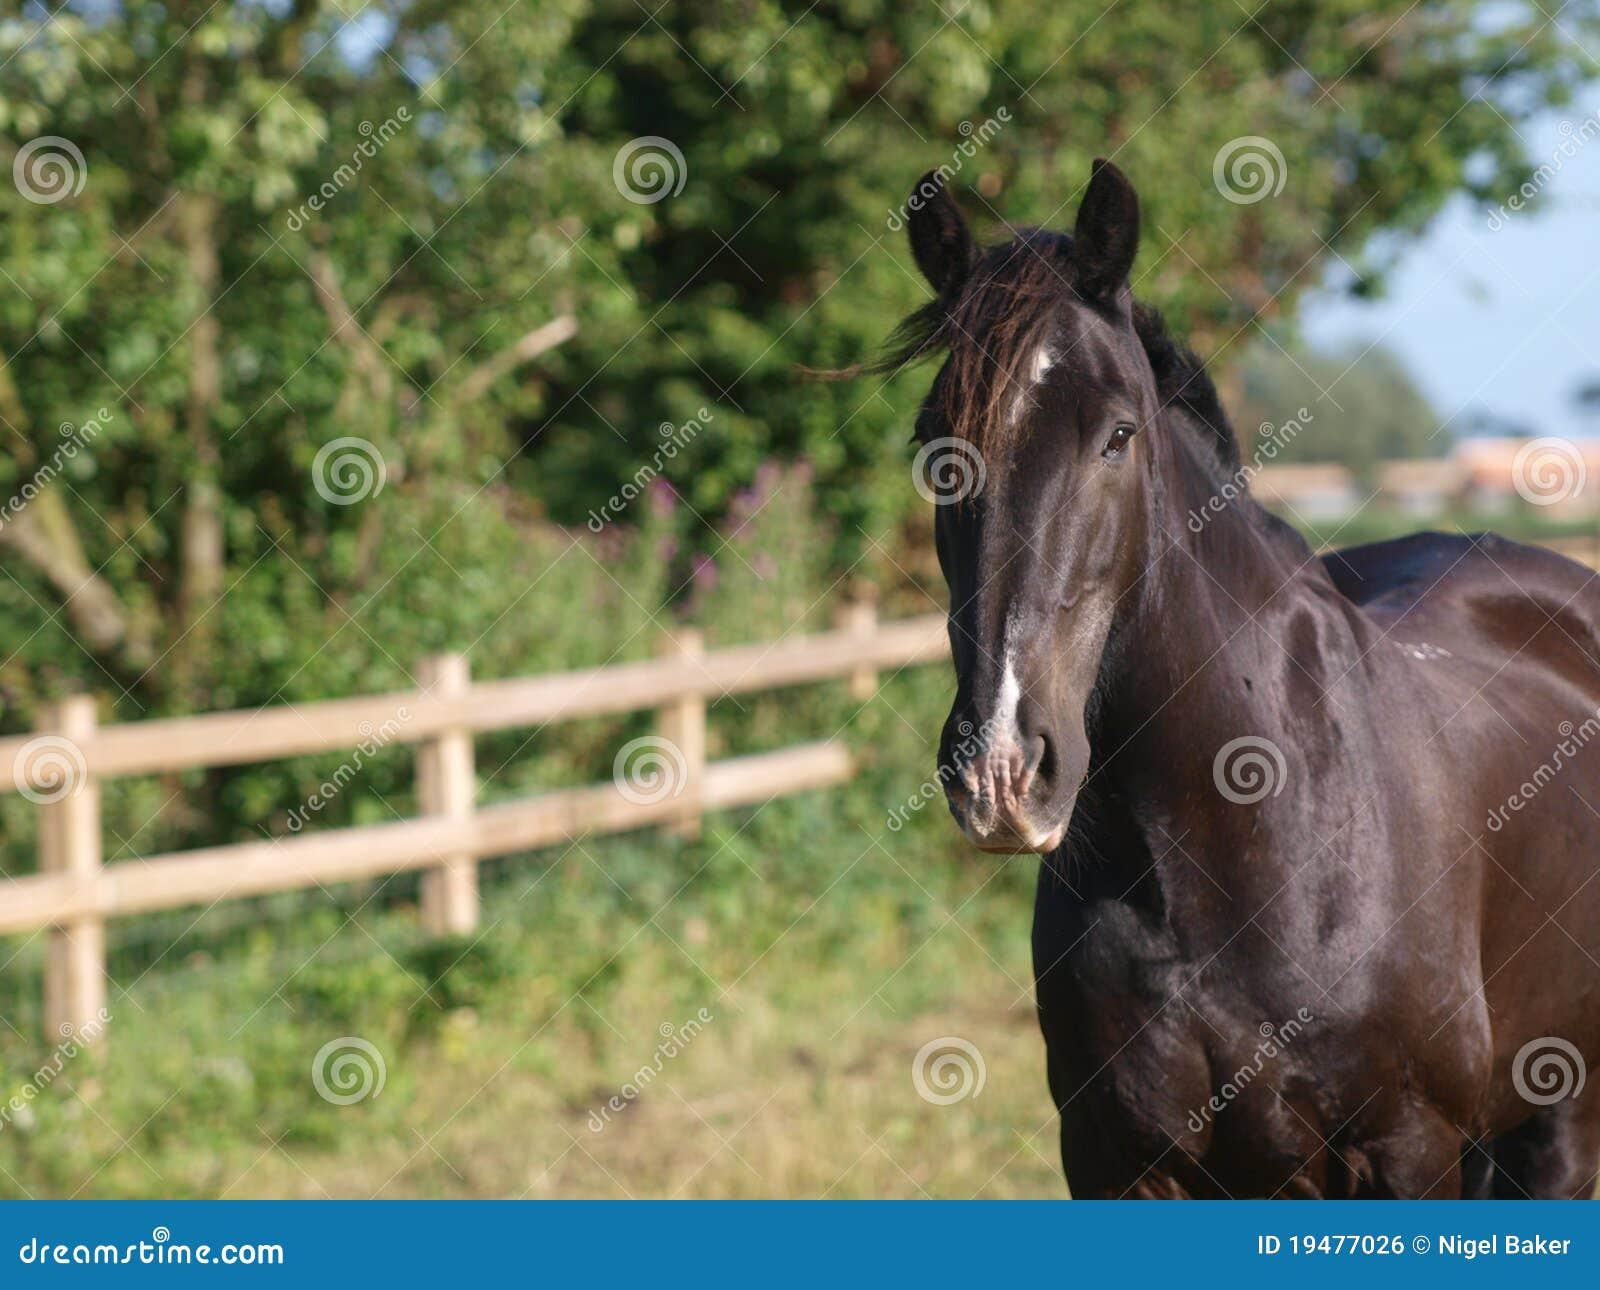 black a horse has - photo #39